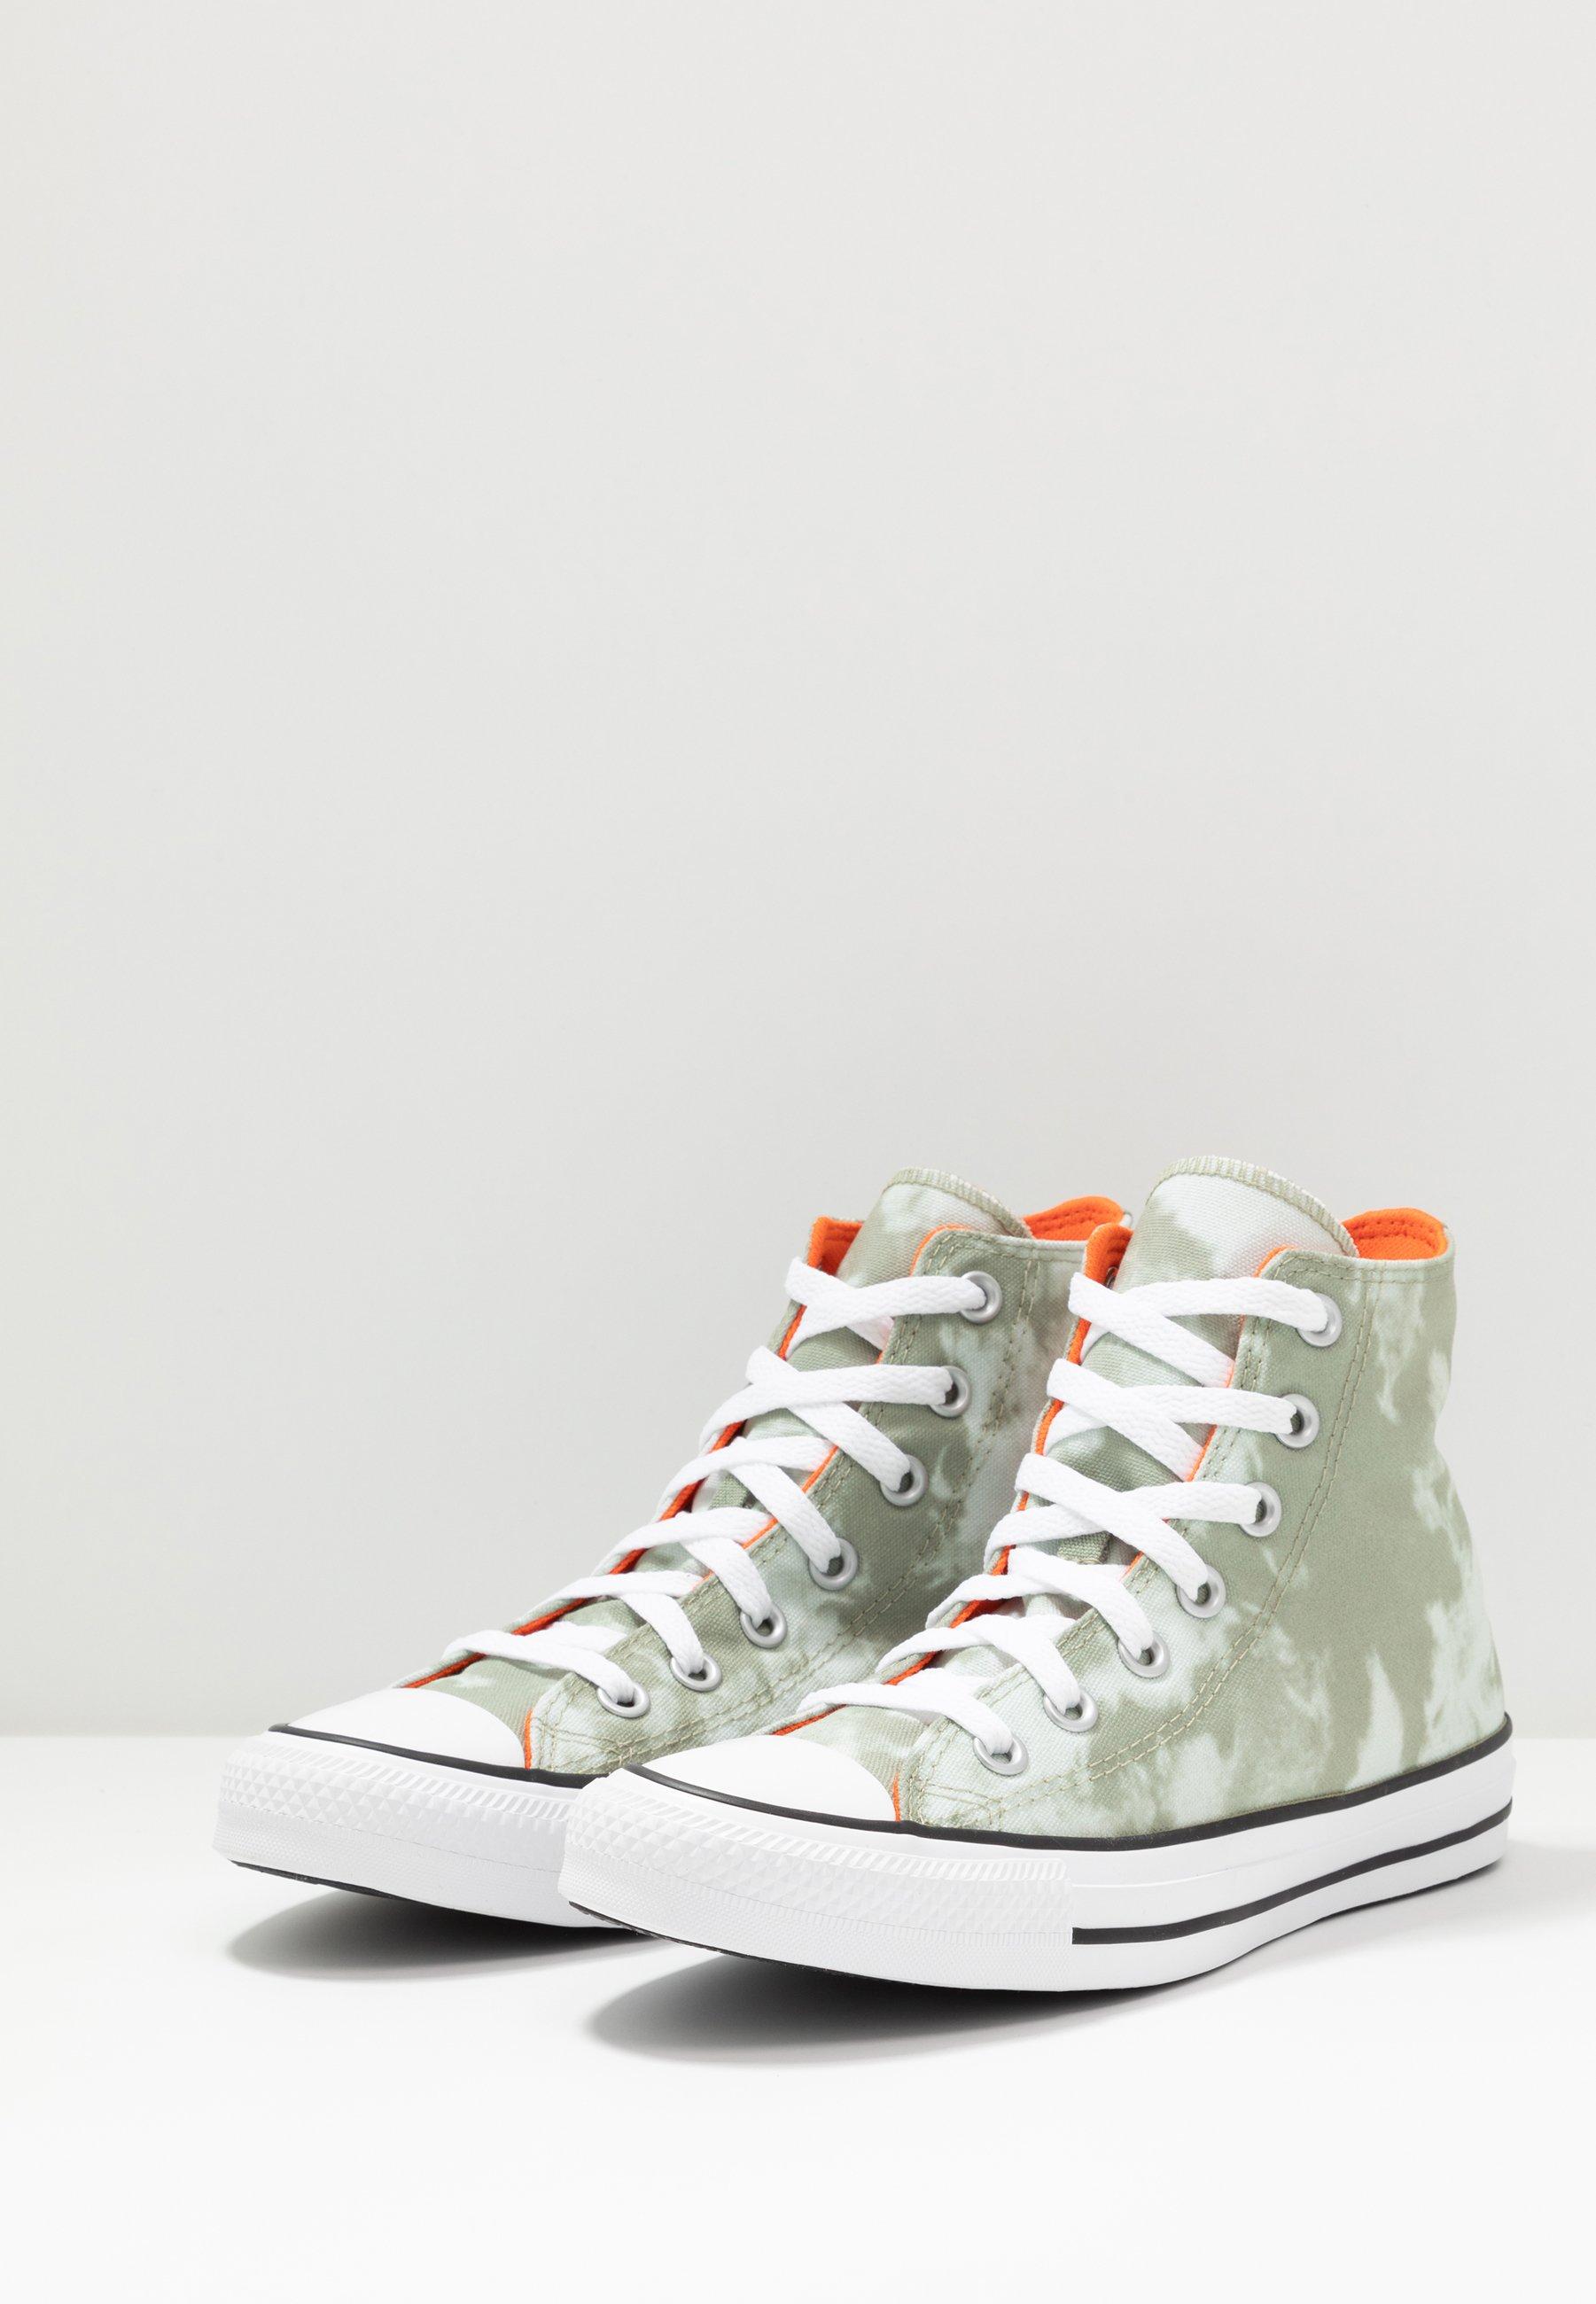 Converse Chuck Taylor All Star - Sneakers Hoog Street Sage/white/black Goedkope Schoenen